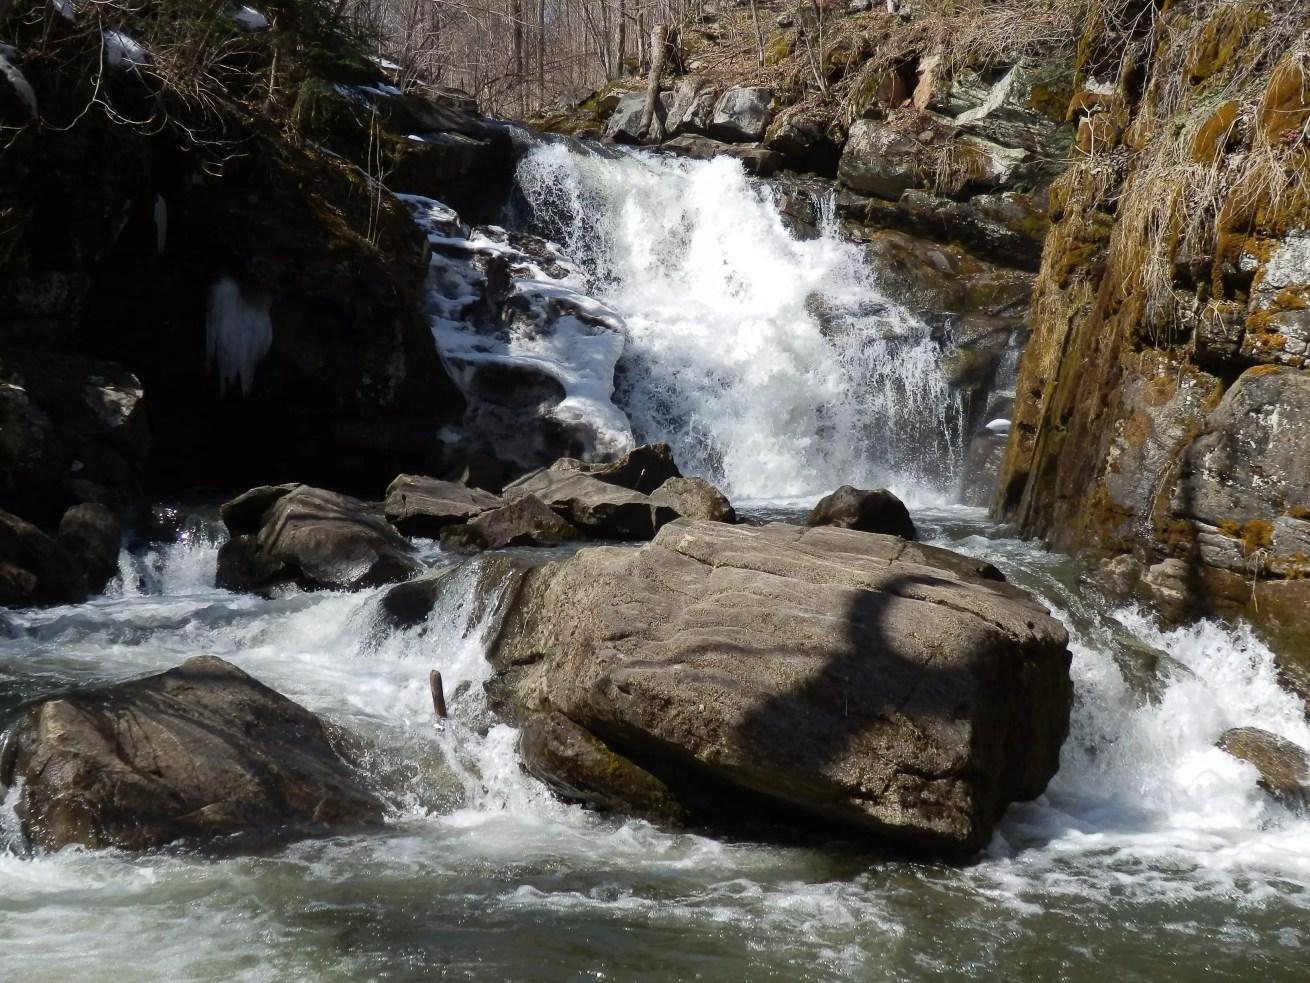 Faville Falls, Herkimer County, New York